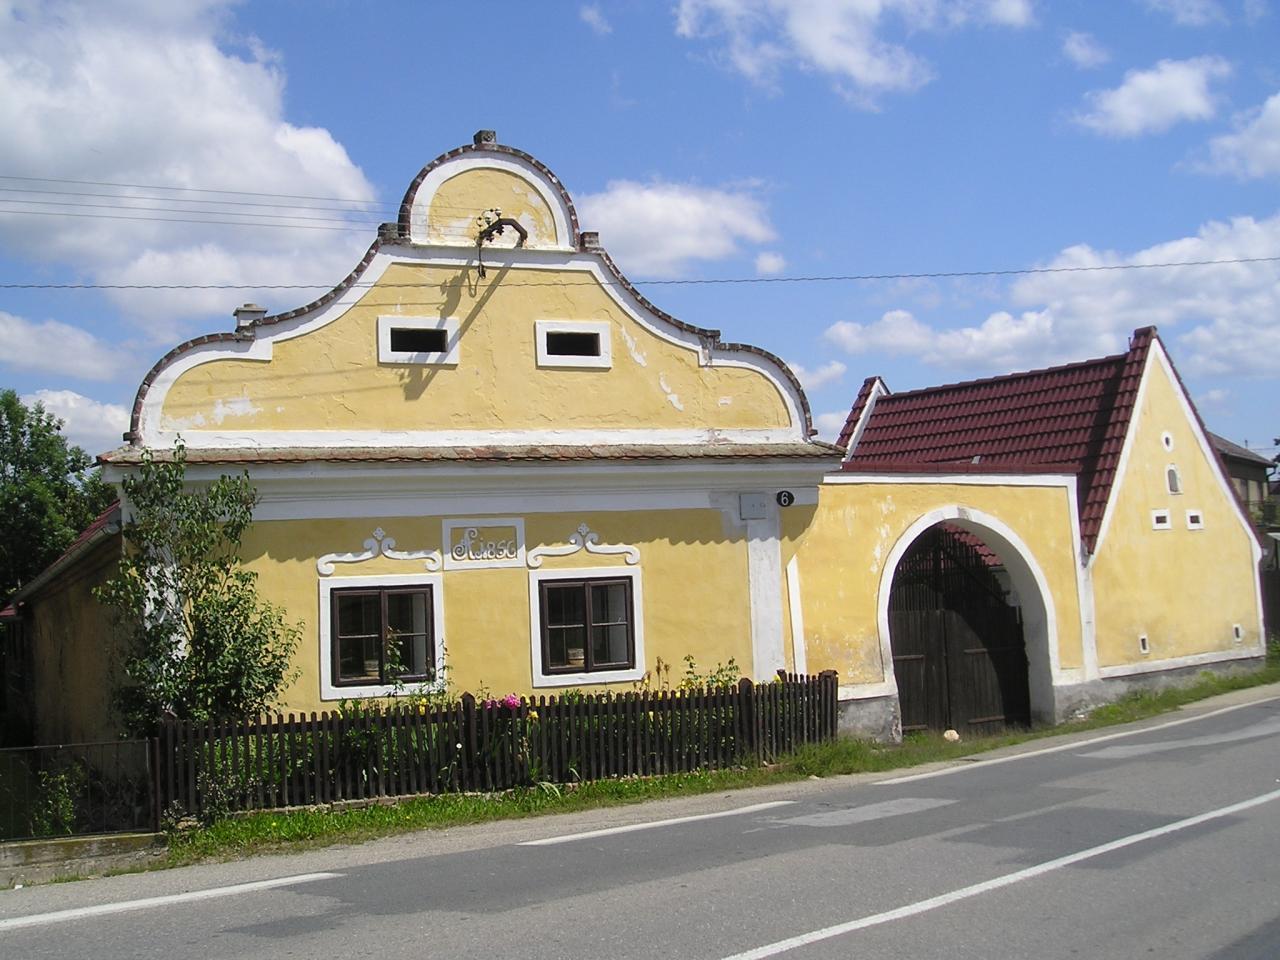 Bildergebnis für Němčice u Netolic